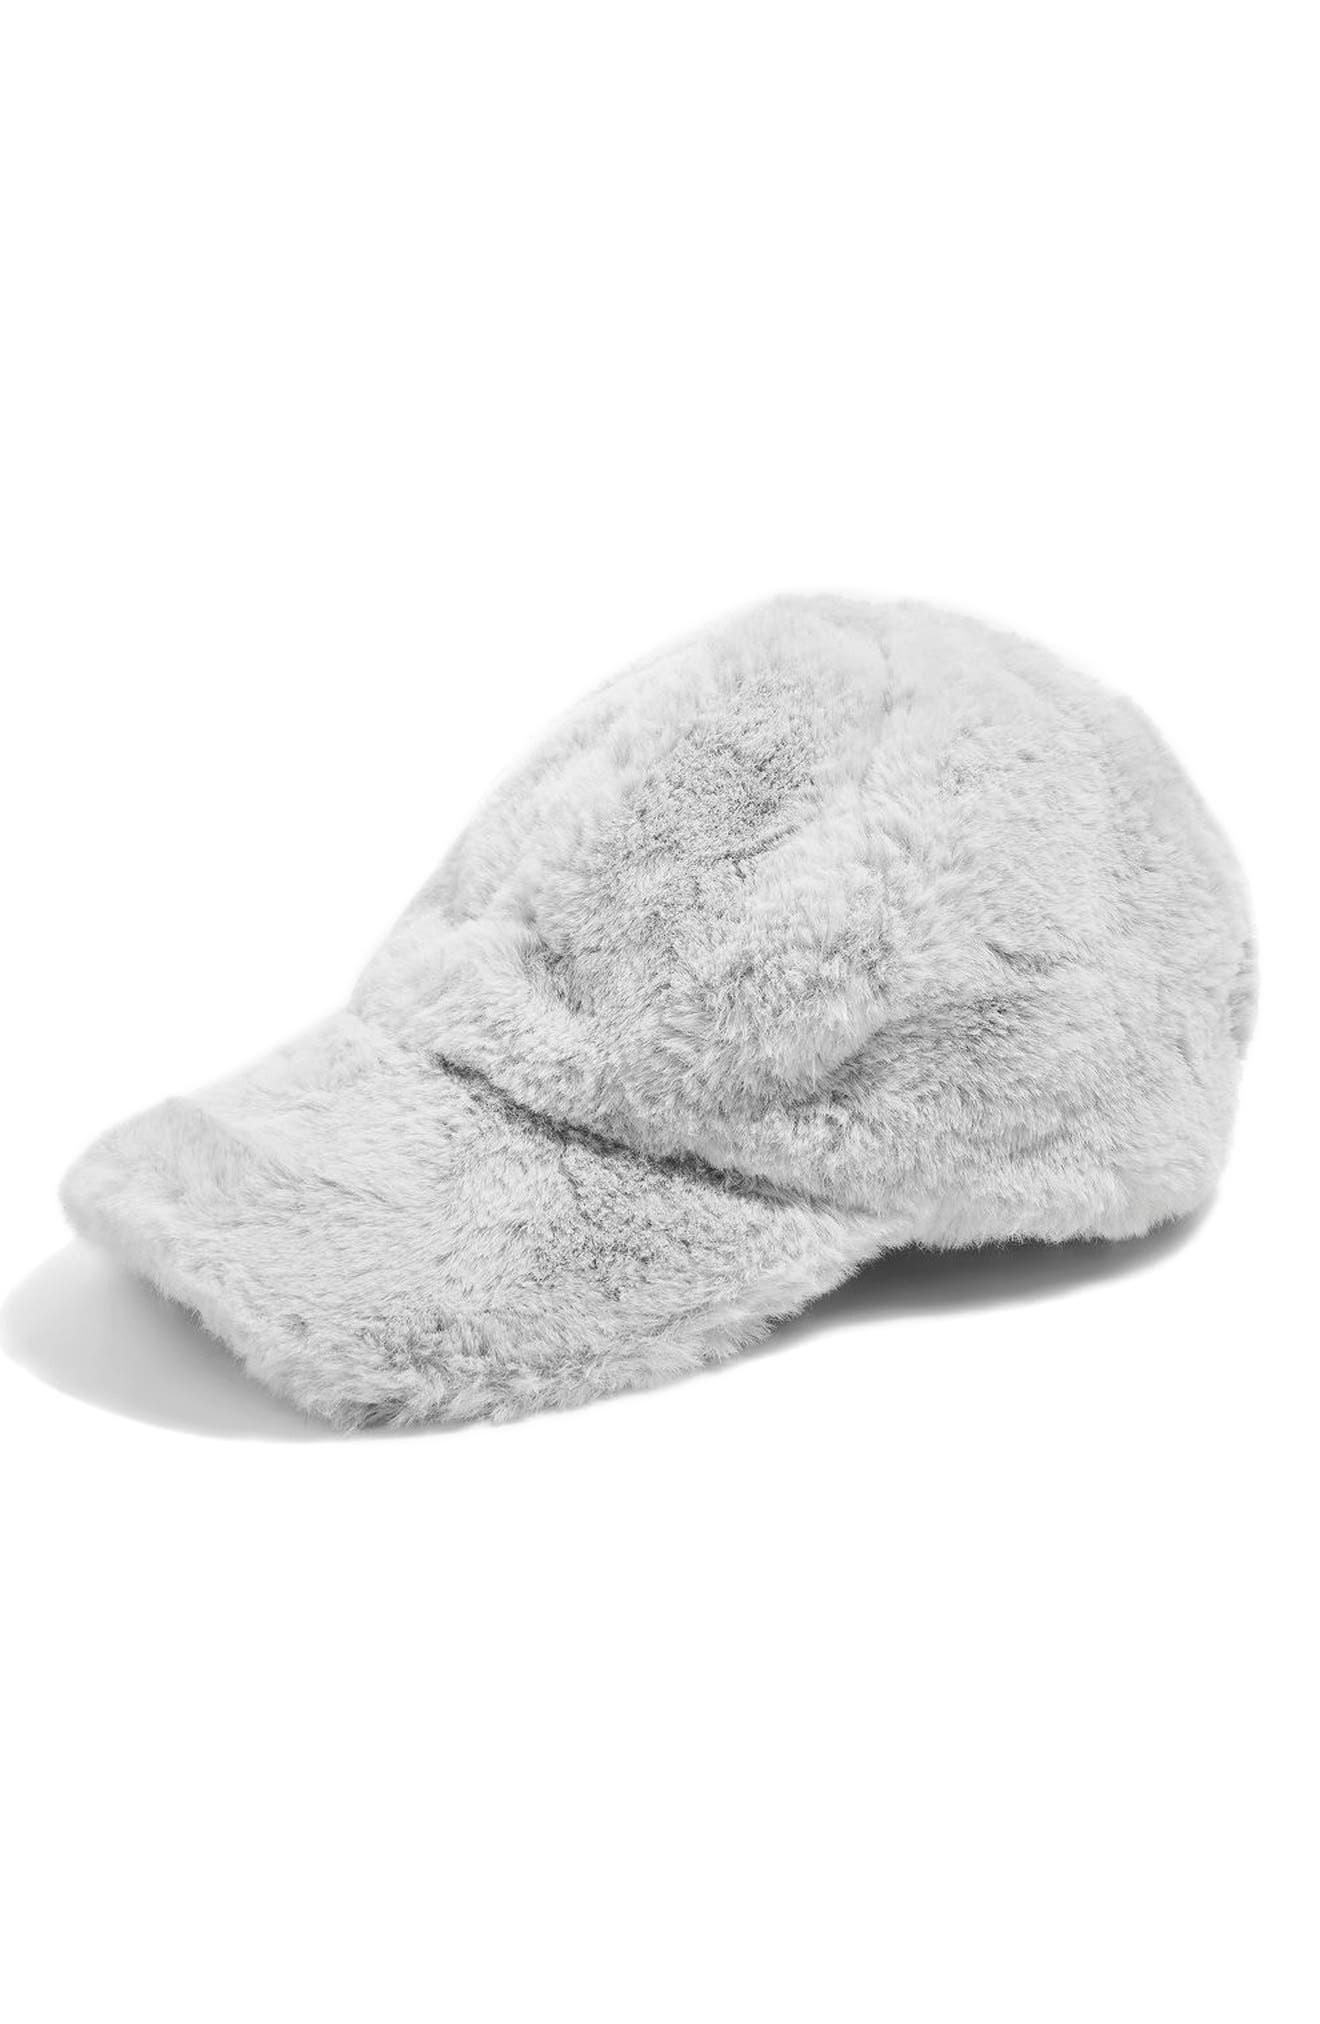 Topshop Faux Fur Baseball Cap